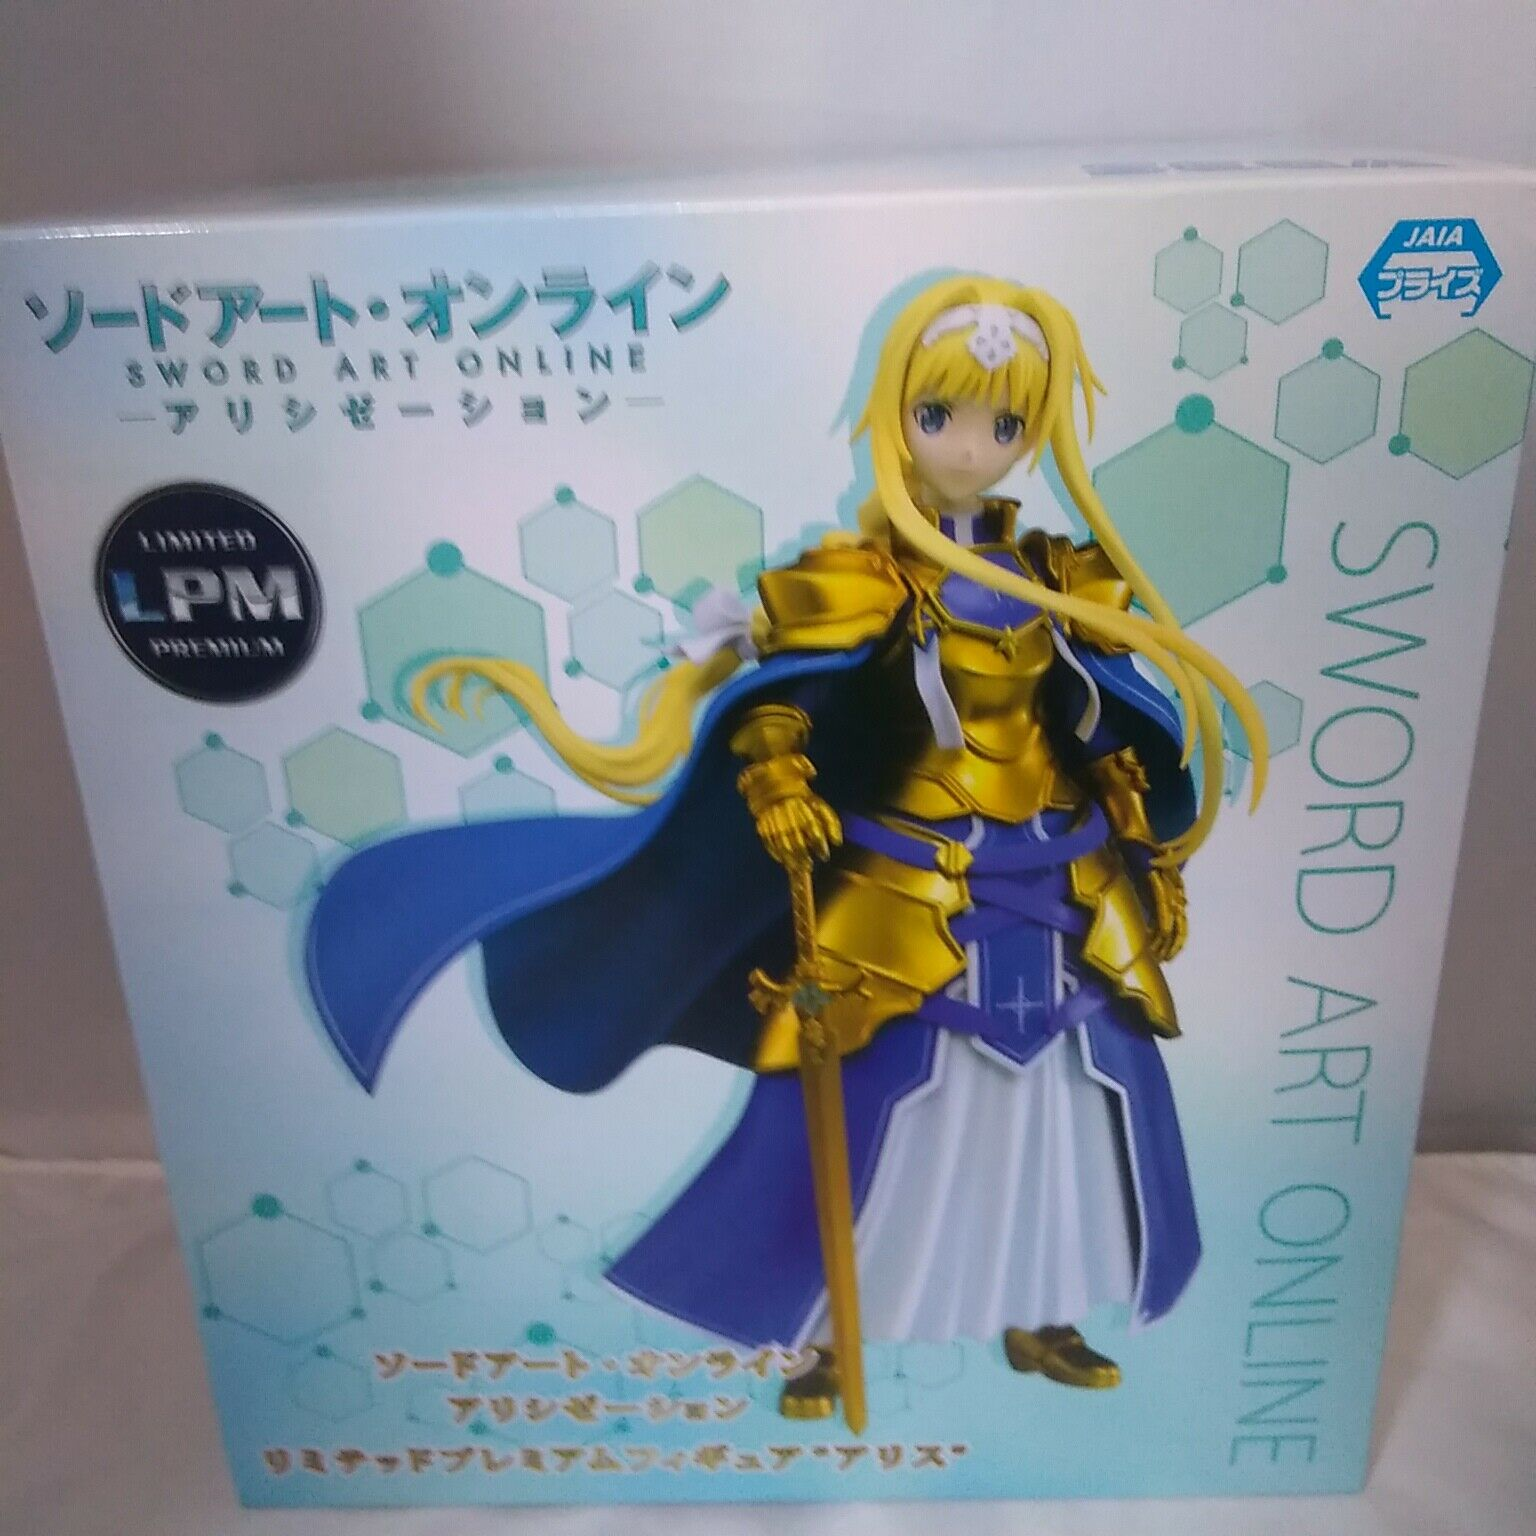 SEGA Sword Art Online Alicization LPM Figure Alice Limited 8.7 inche Figure F S